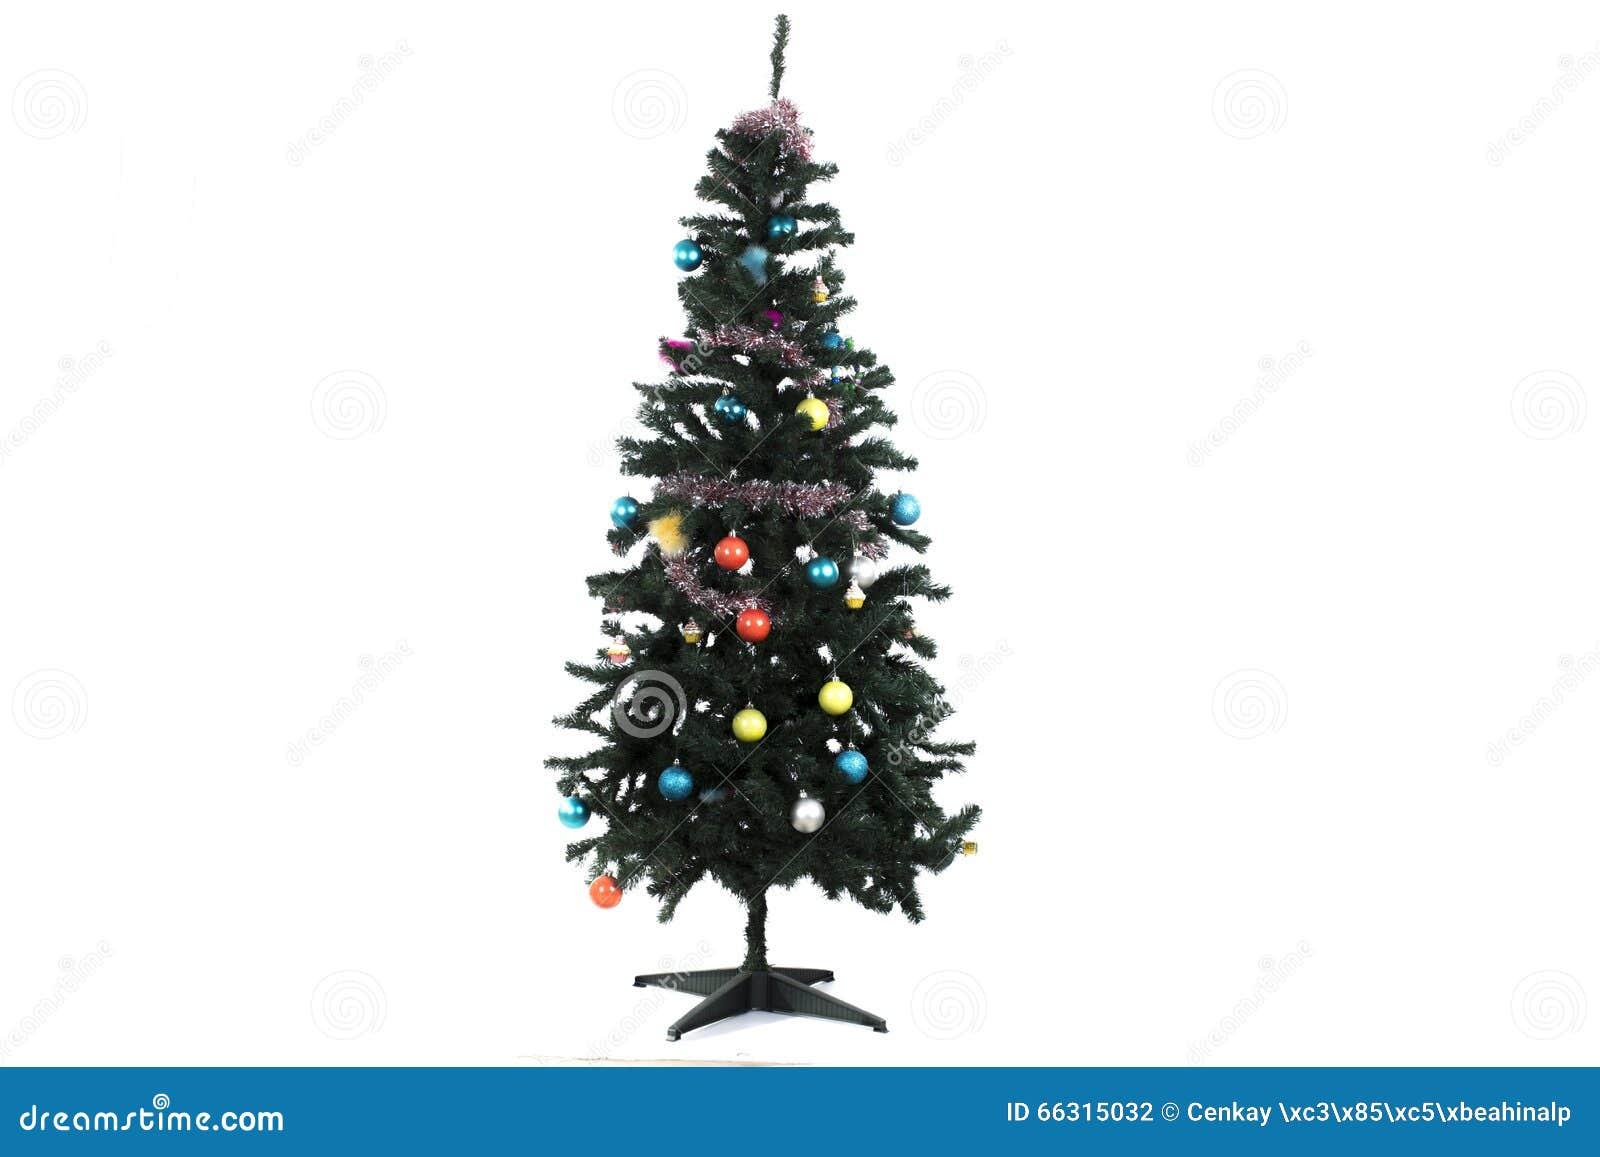 Ugly Christmas Tree.Sloppy Ugly Christmas Tree Stock Photo Image Of